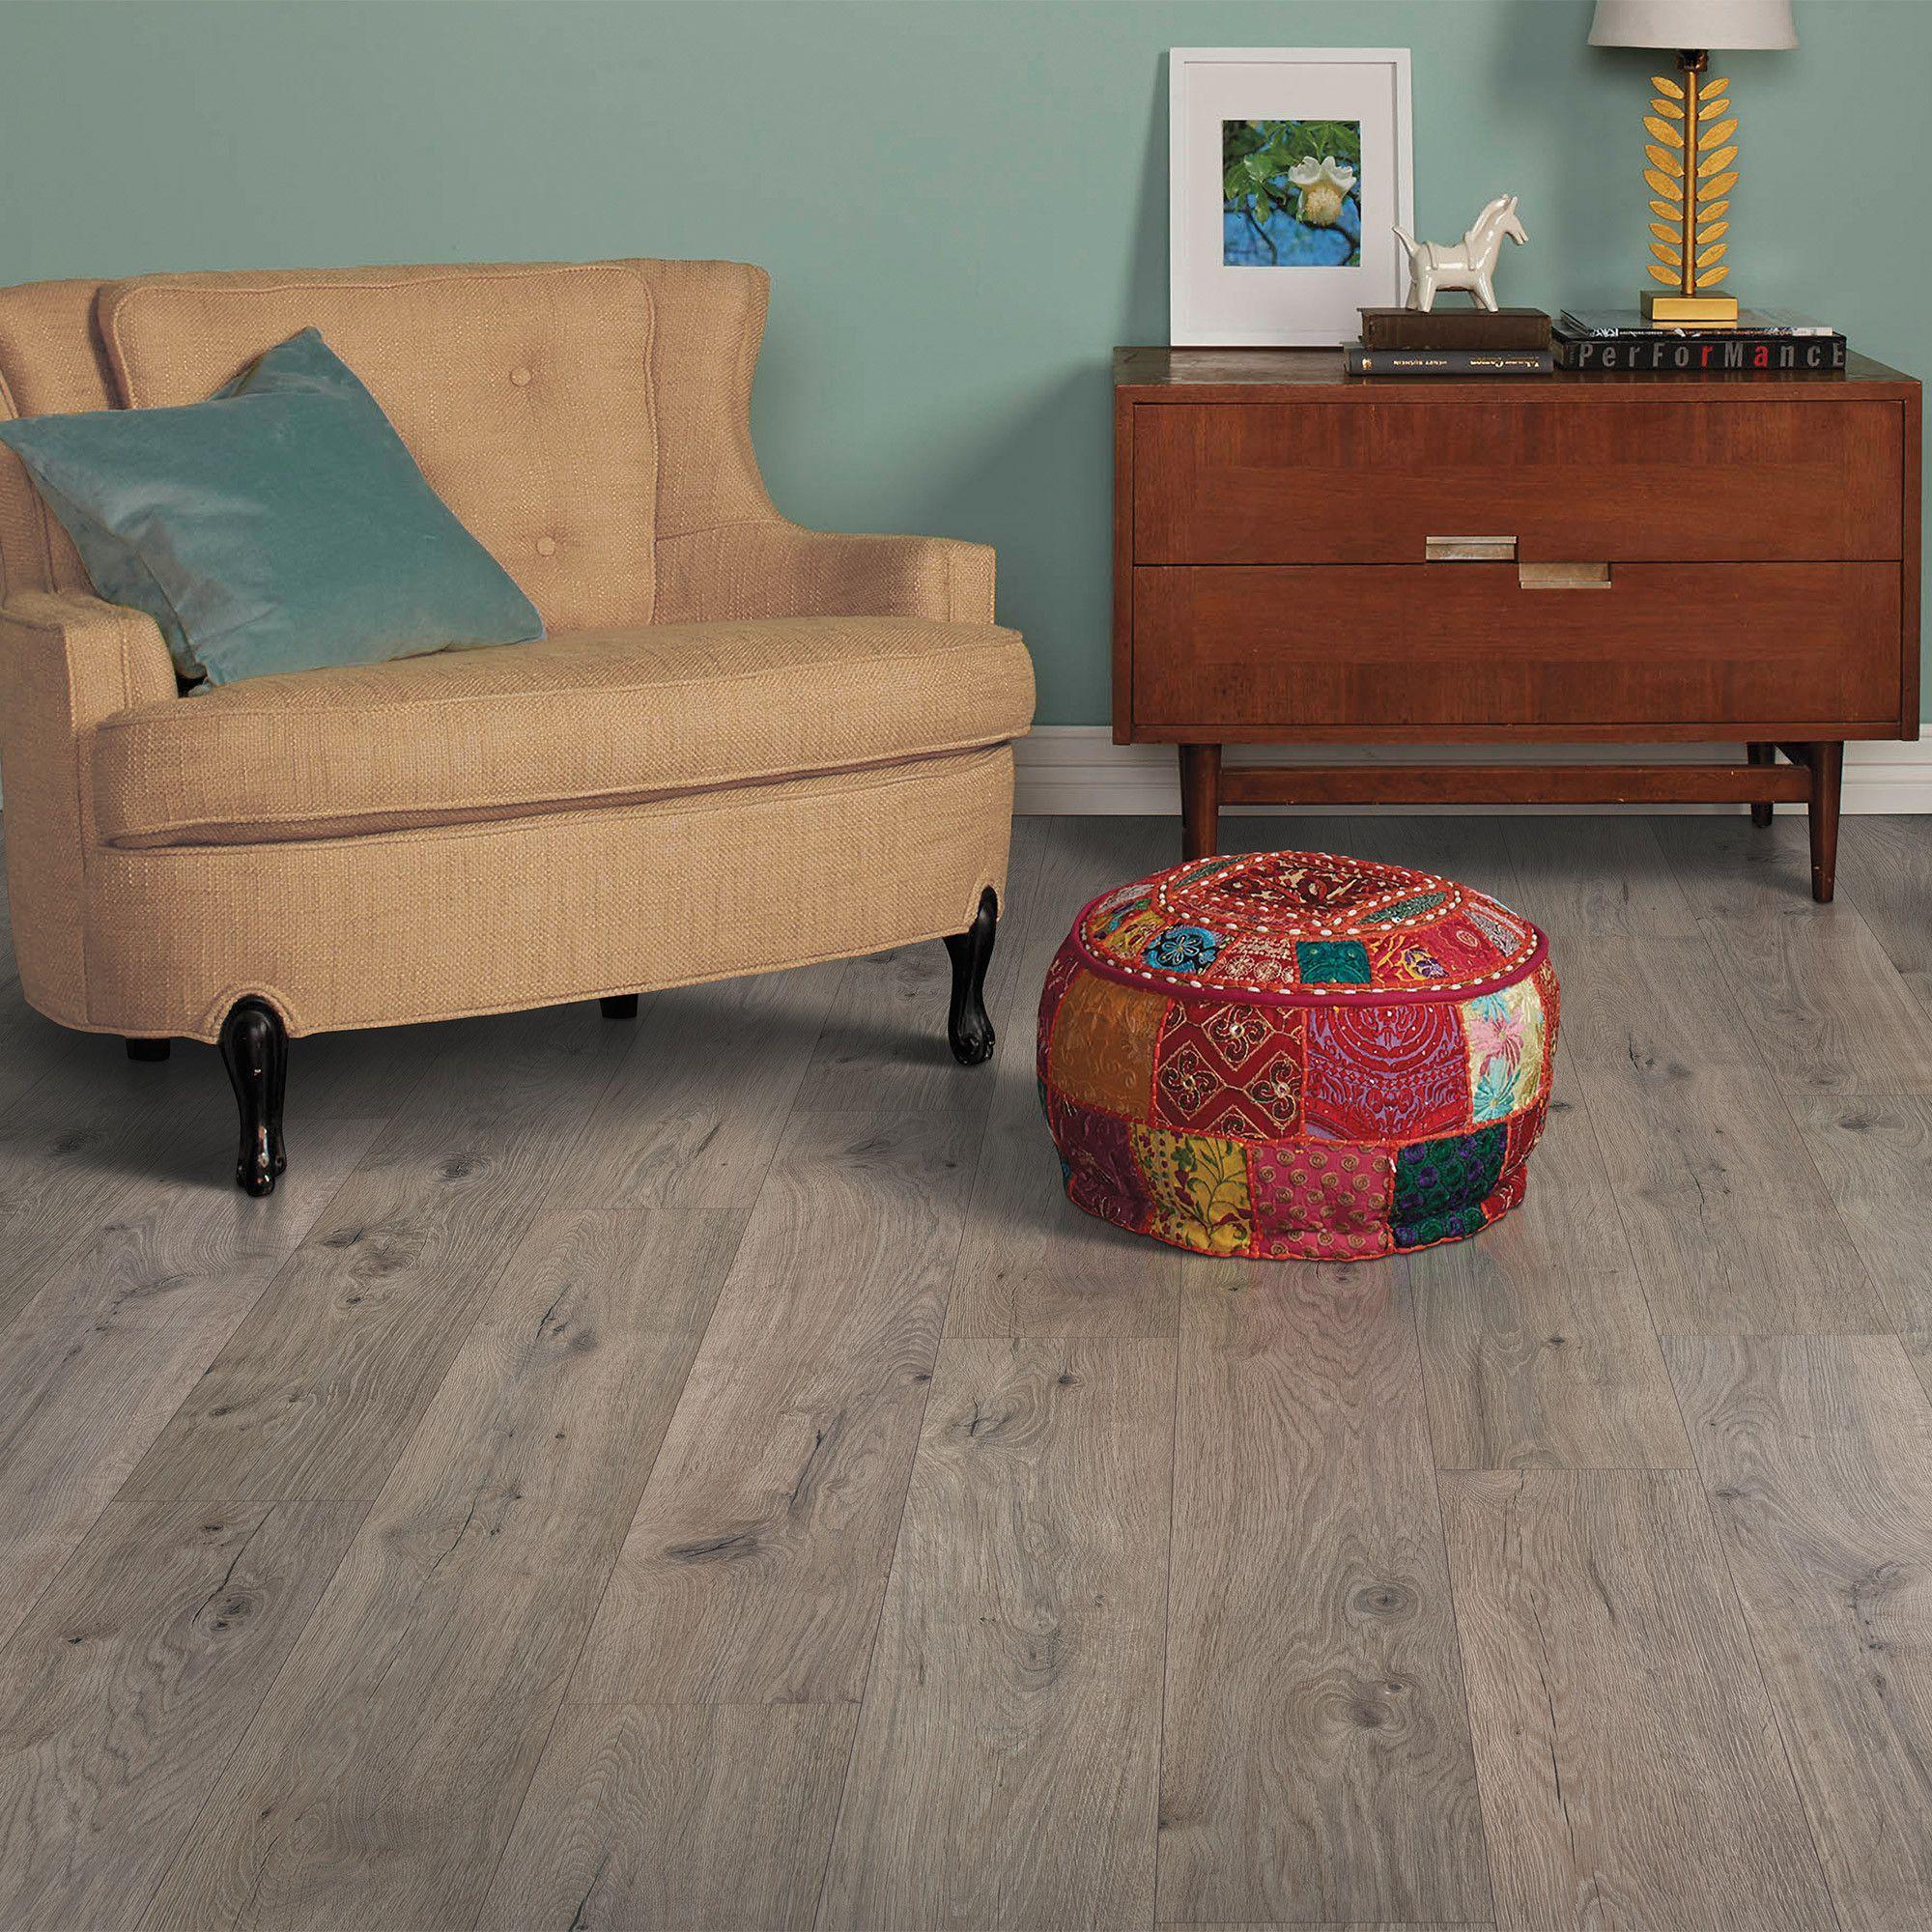 Harmonics Silverleaf Oak Laminate Flooring 22 08 Sq Ft Per